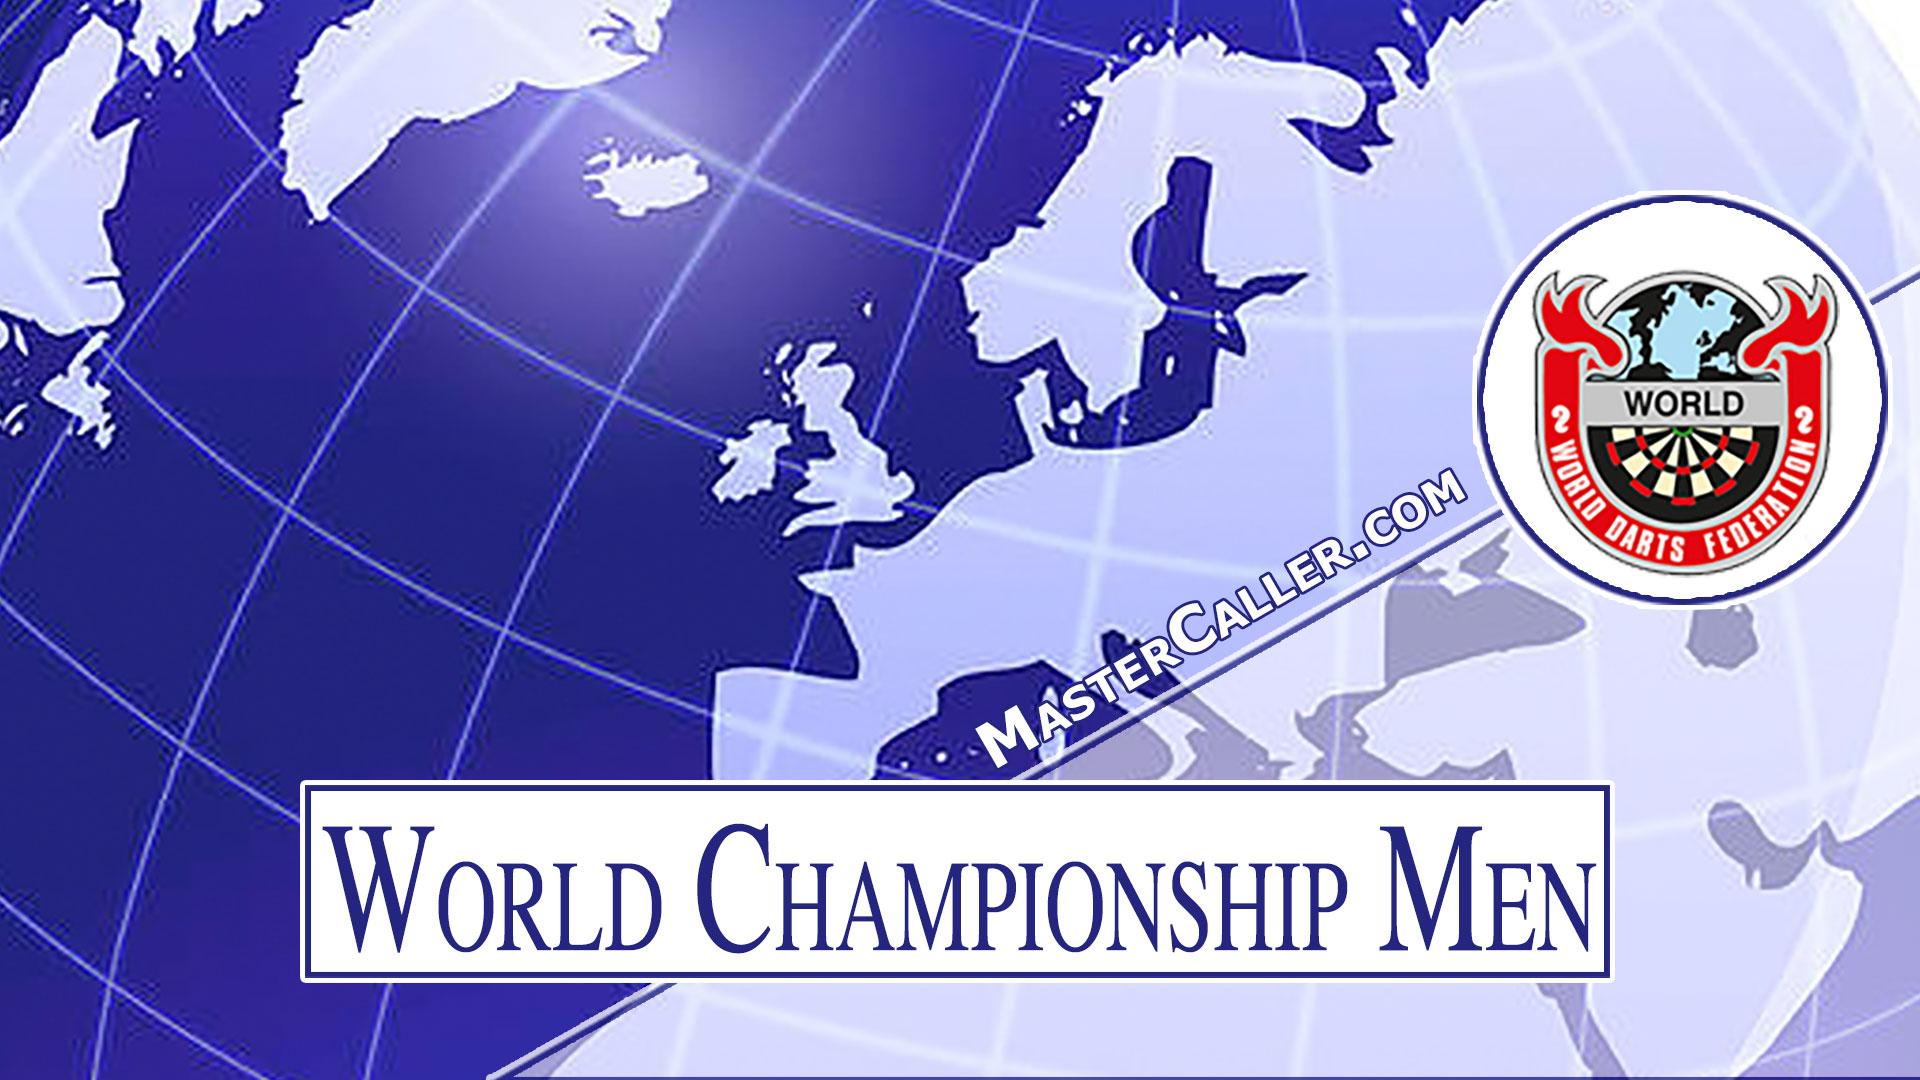 World Championship Qualifiers Men - 2022 Logo